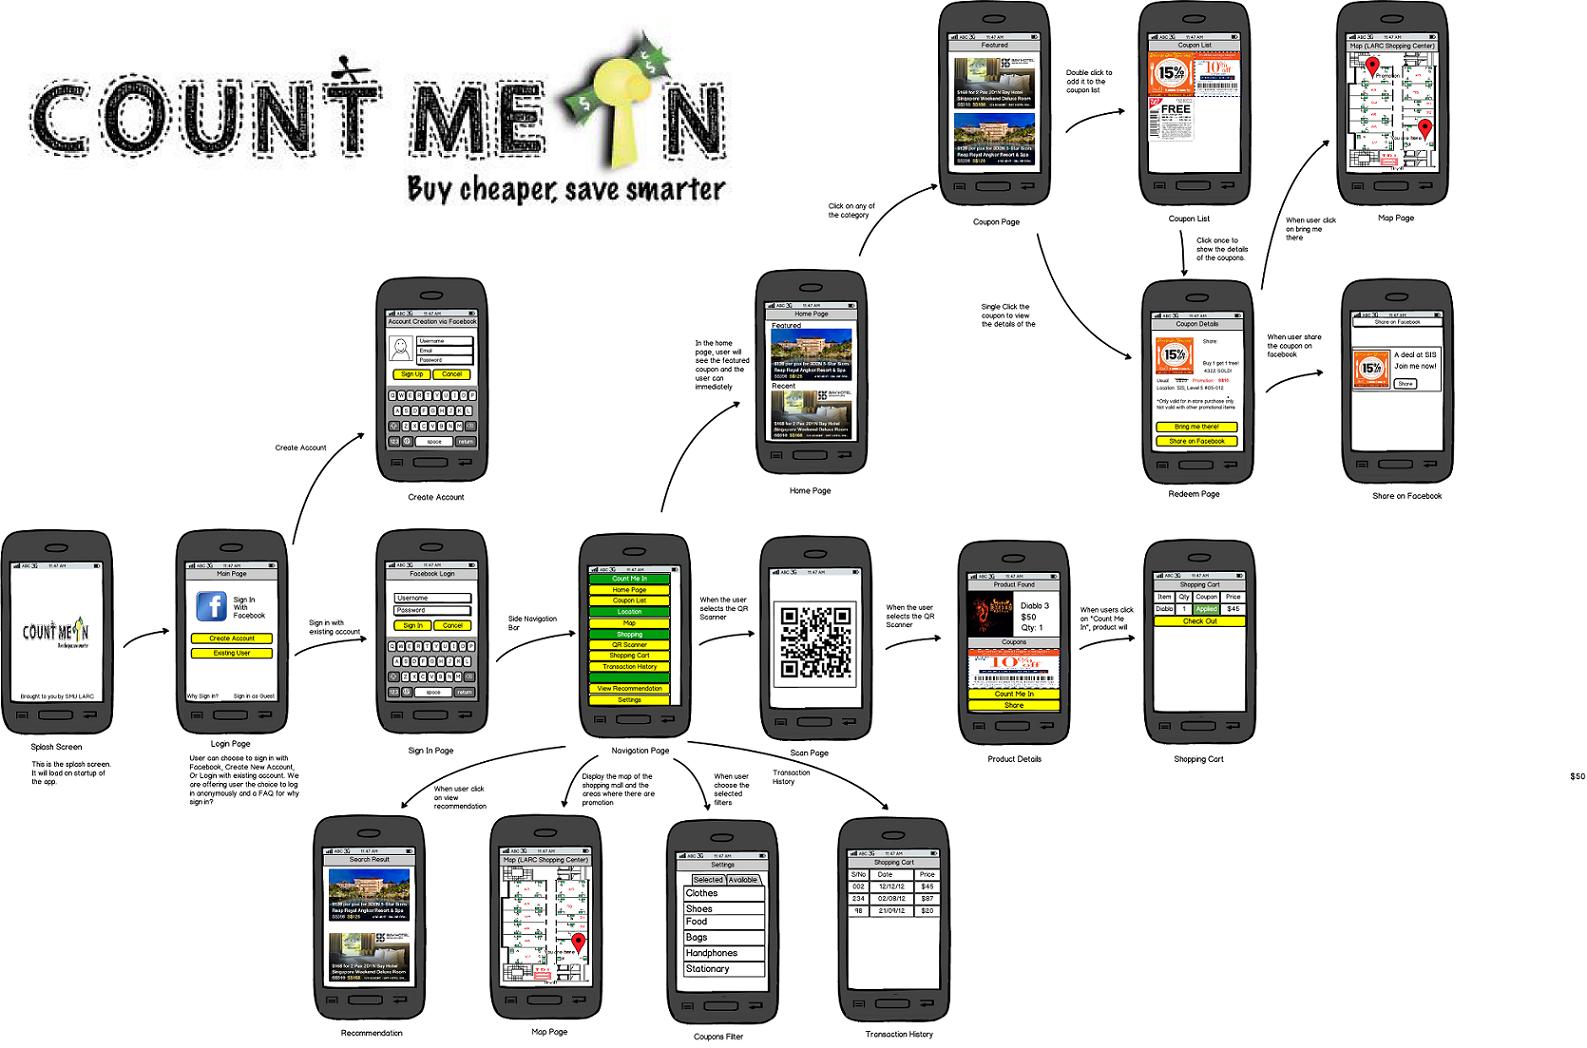 android mockup - Android Mockup Tool Free